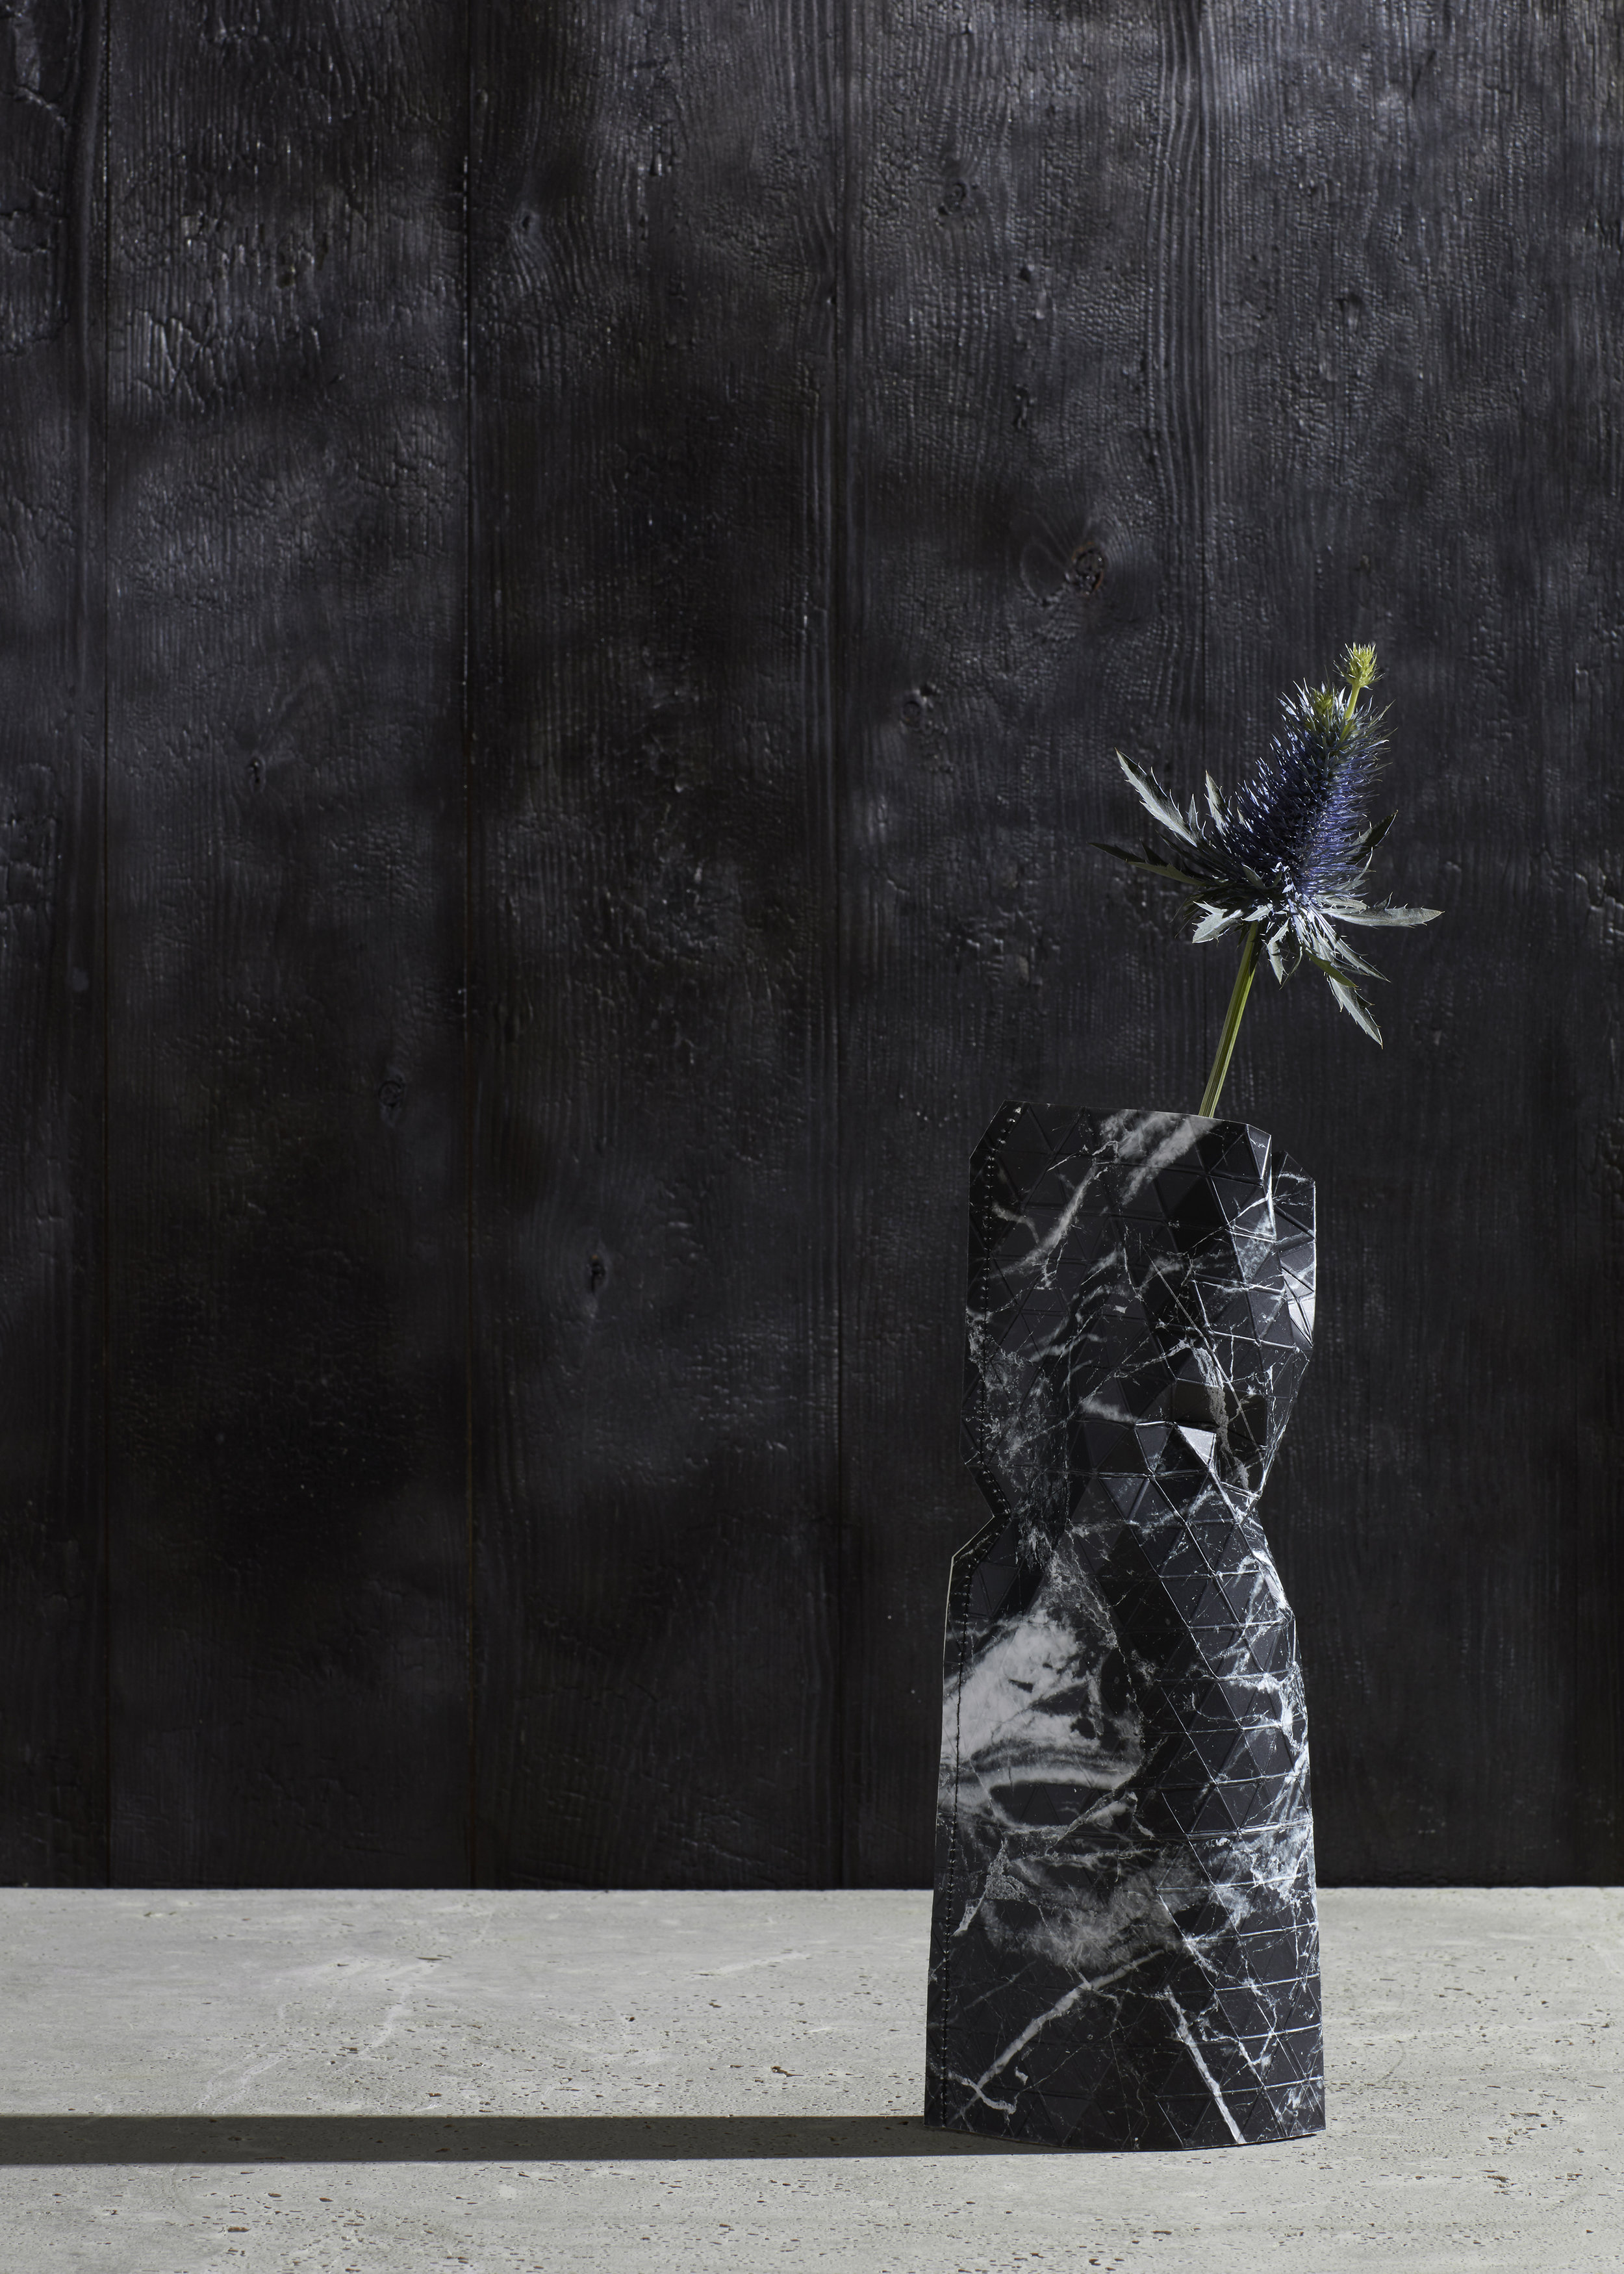 18.06.2018_Flowers Test_LSR_044040146.jpg